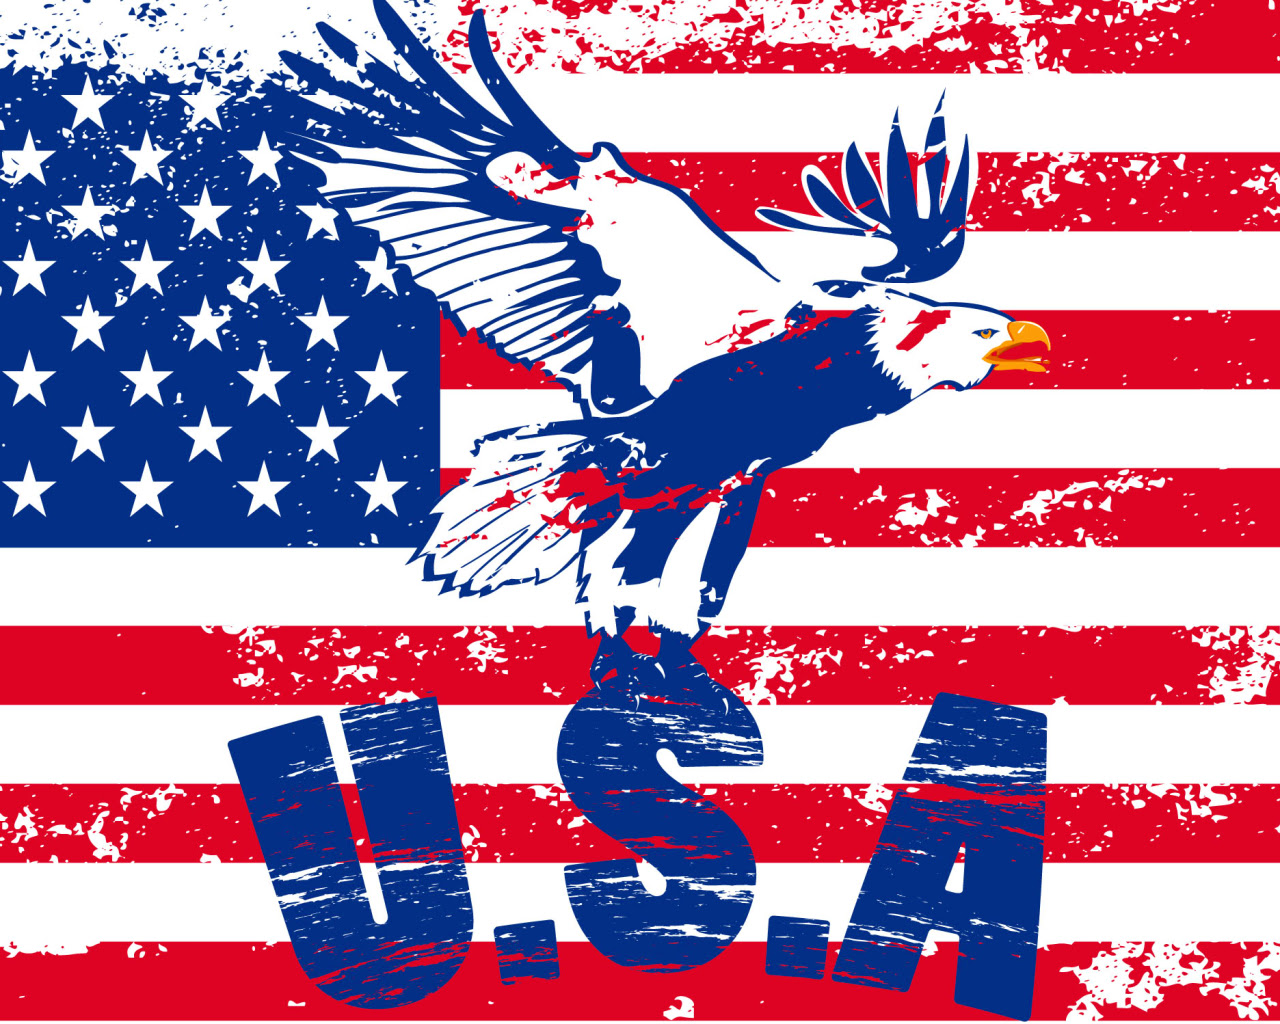 American Flag United States Of America Wallpaper 40448775 Fanpop